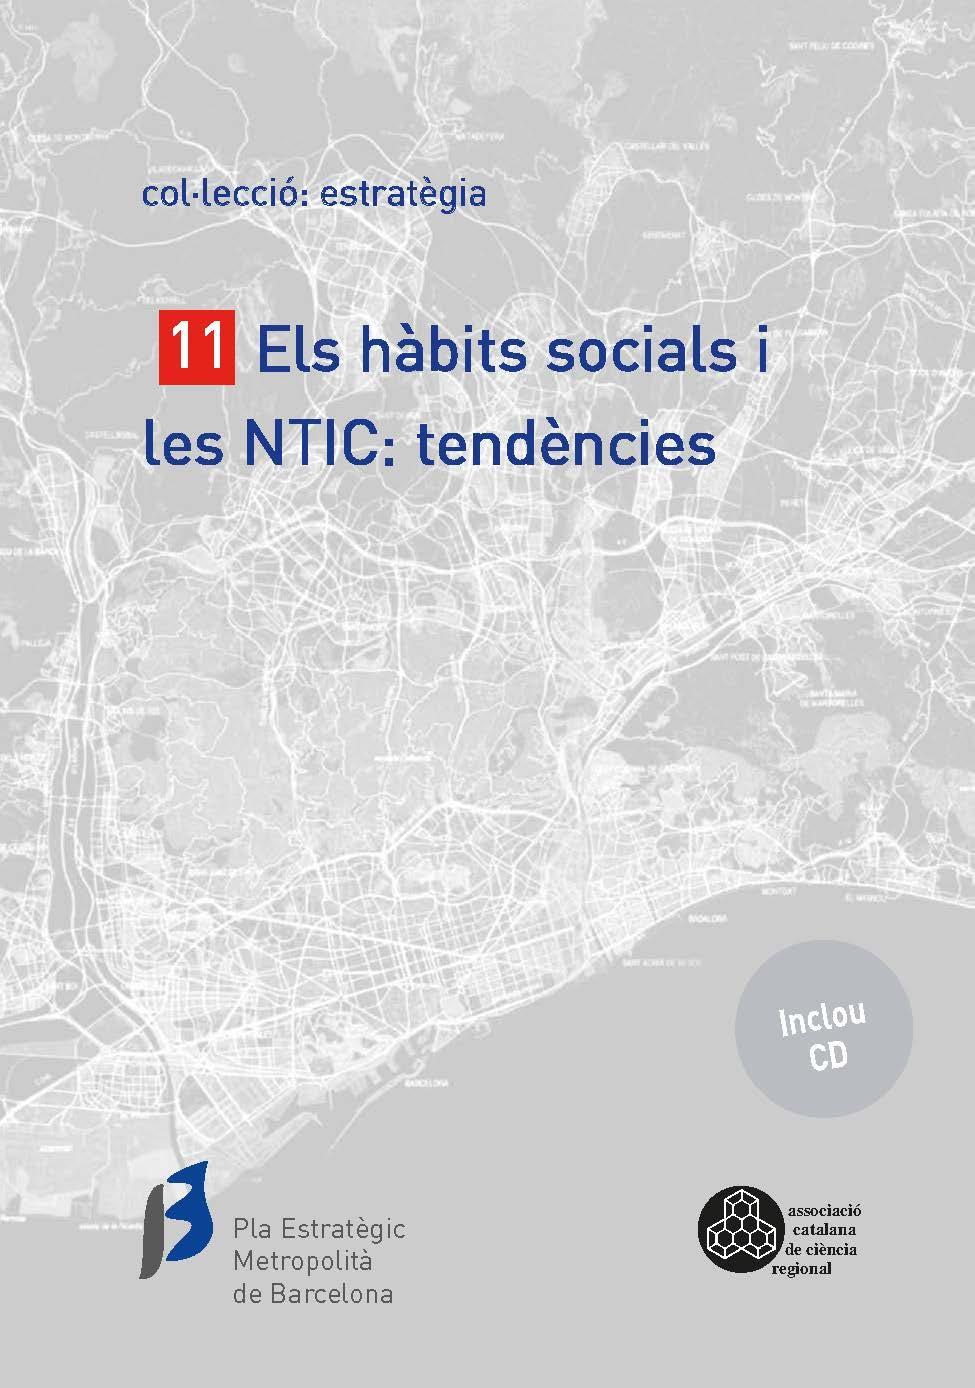 Tendencias NTIC